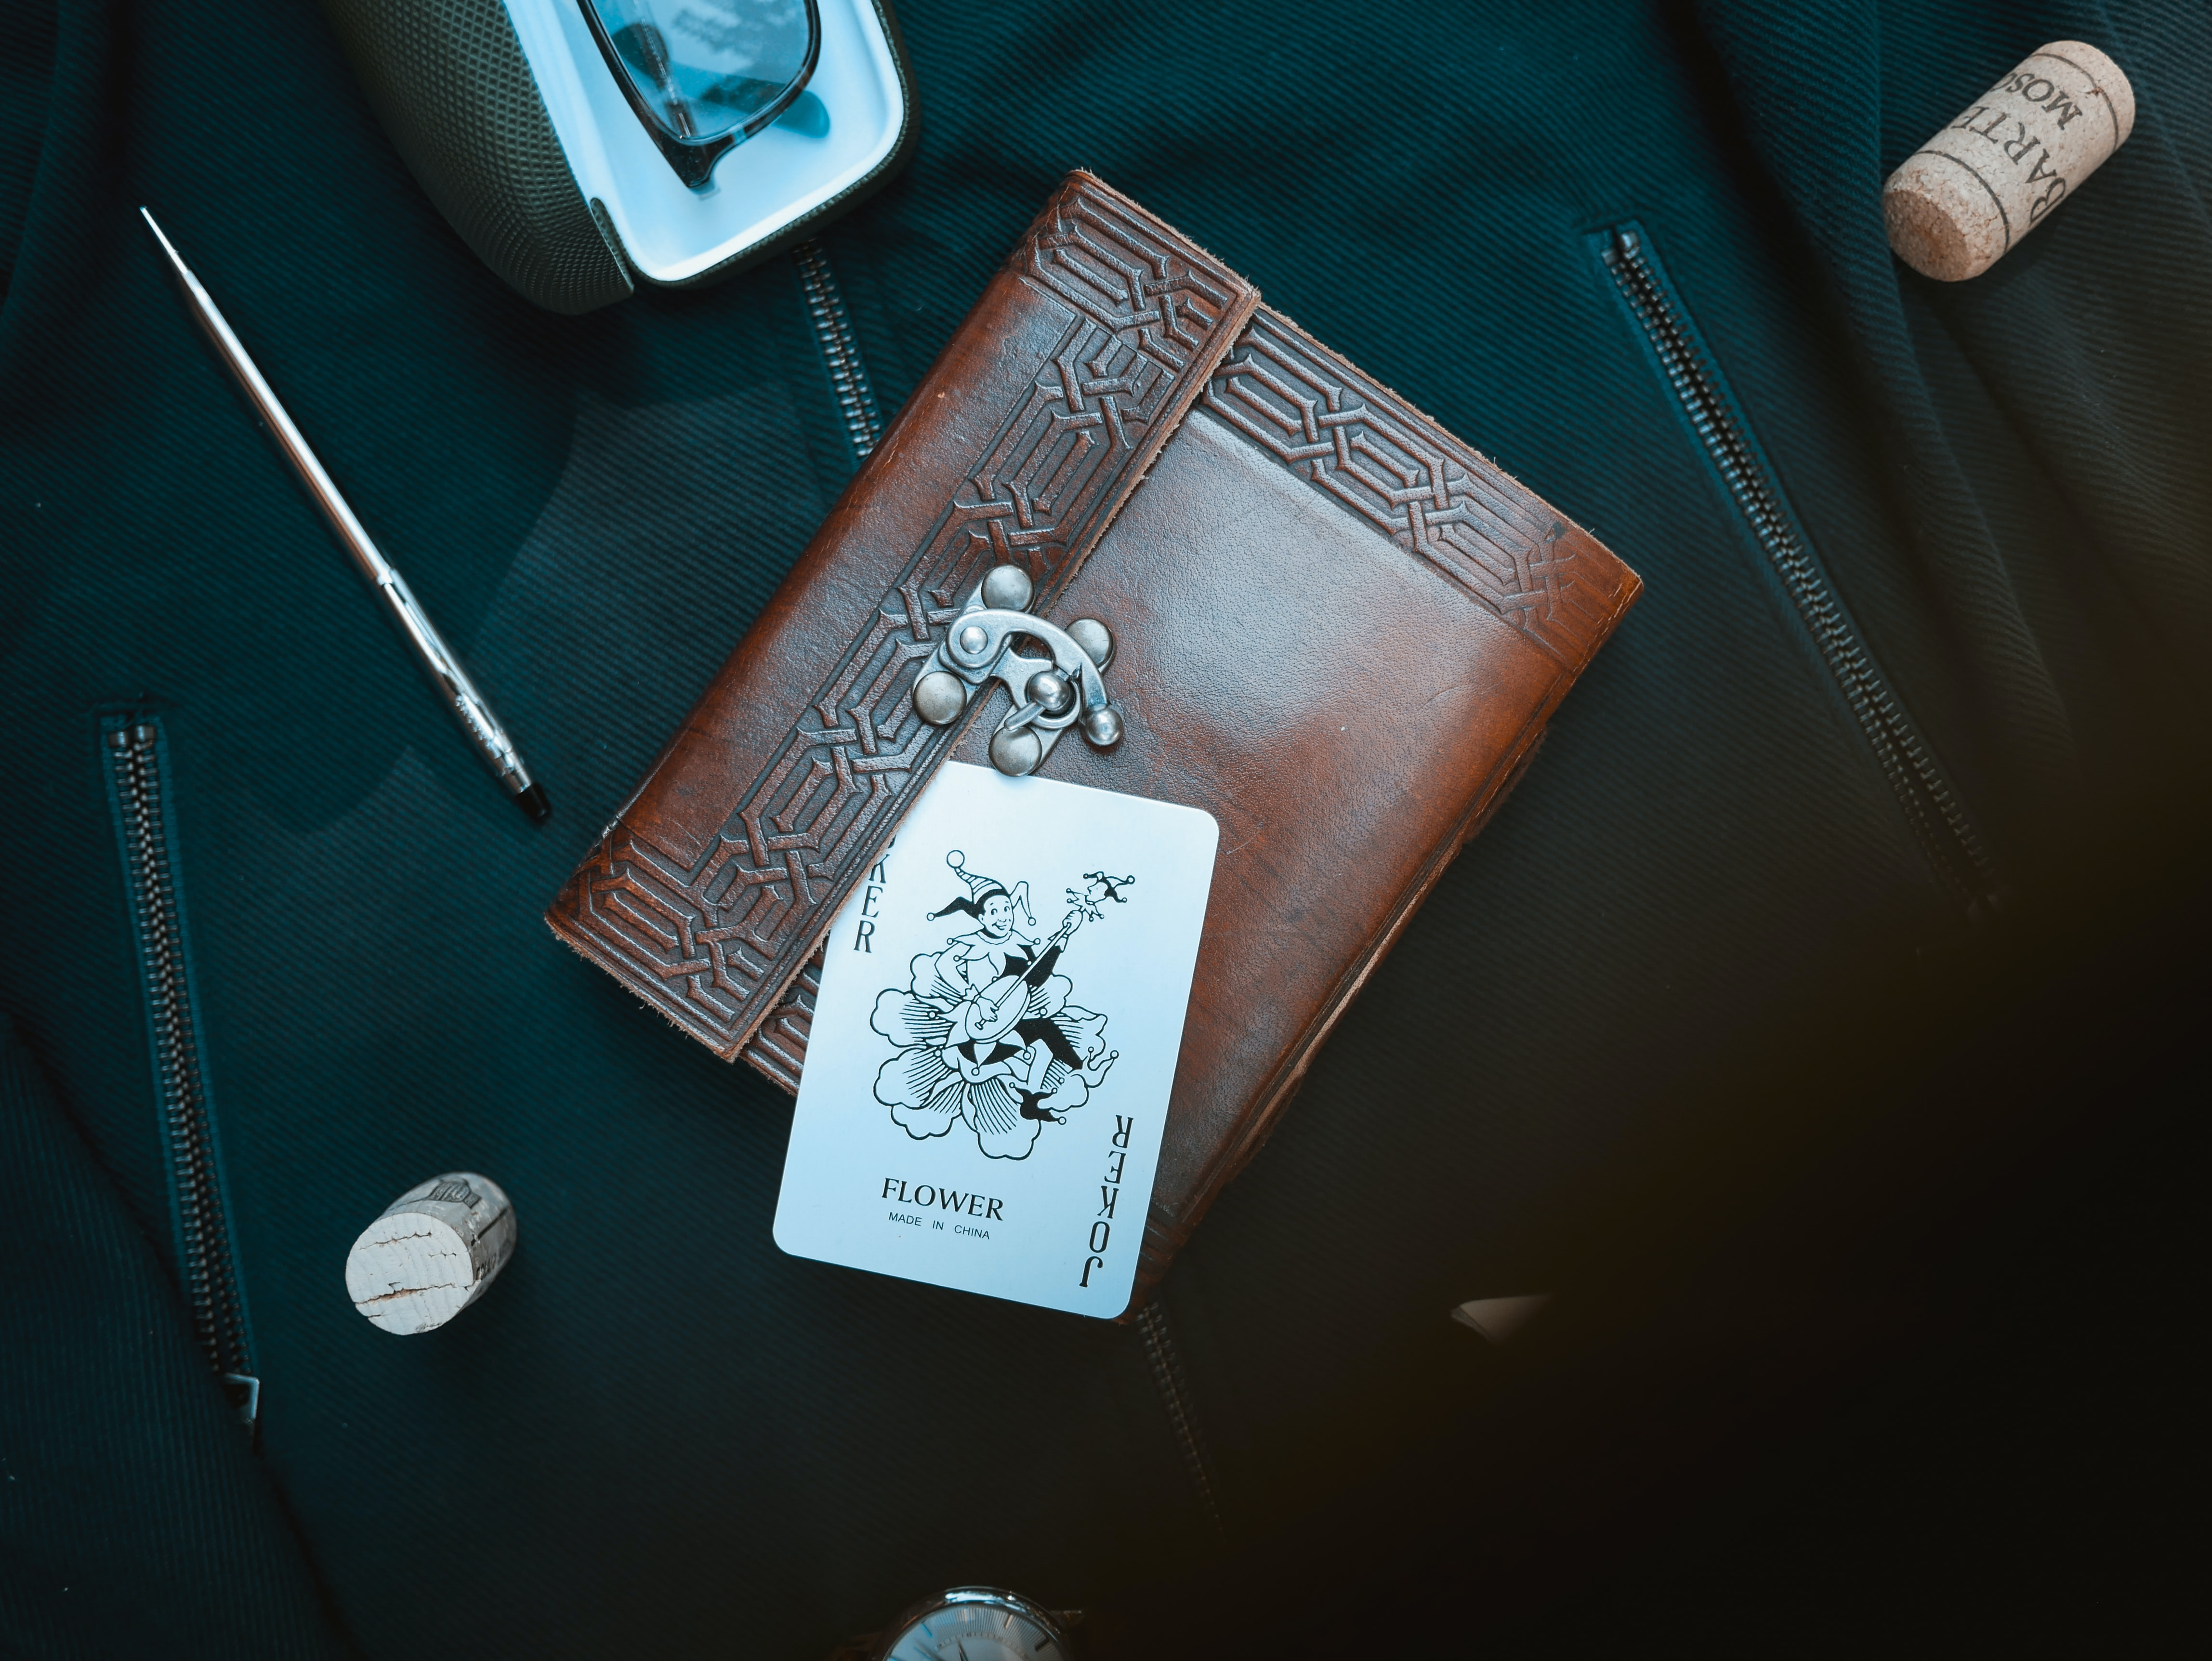 joker playing card on brown purse